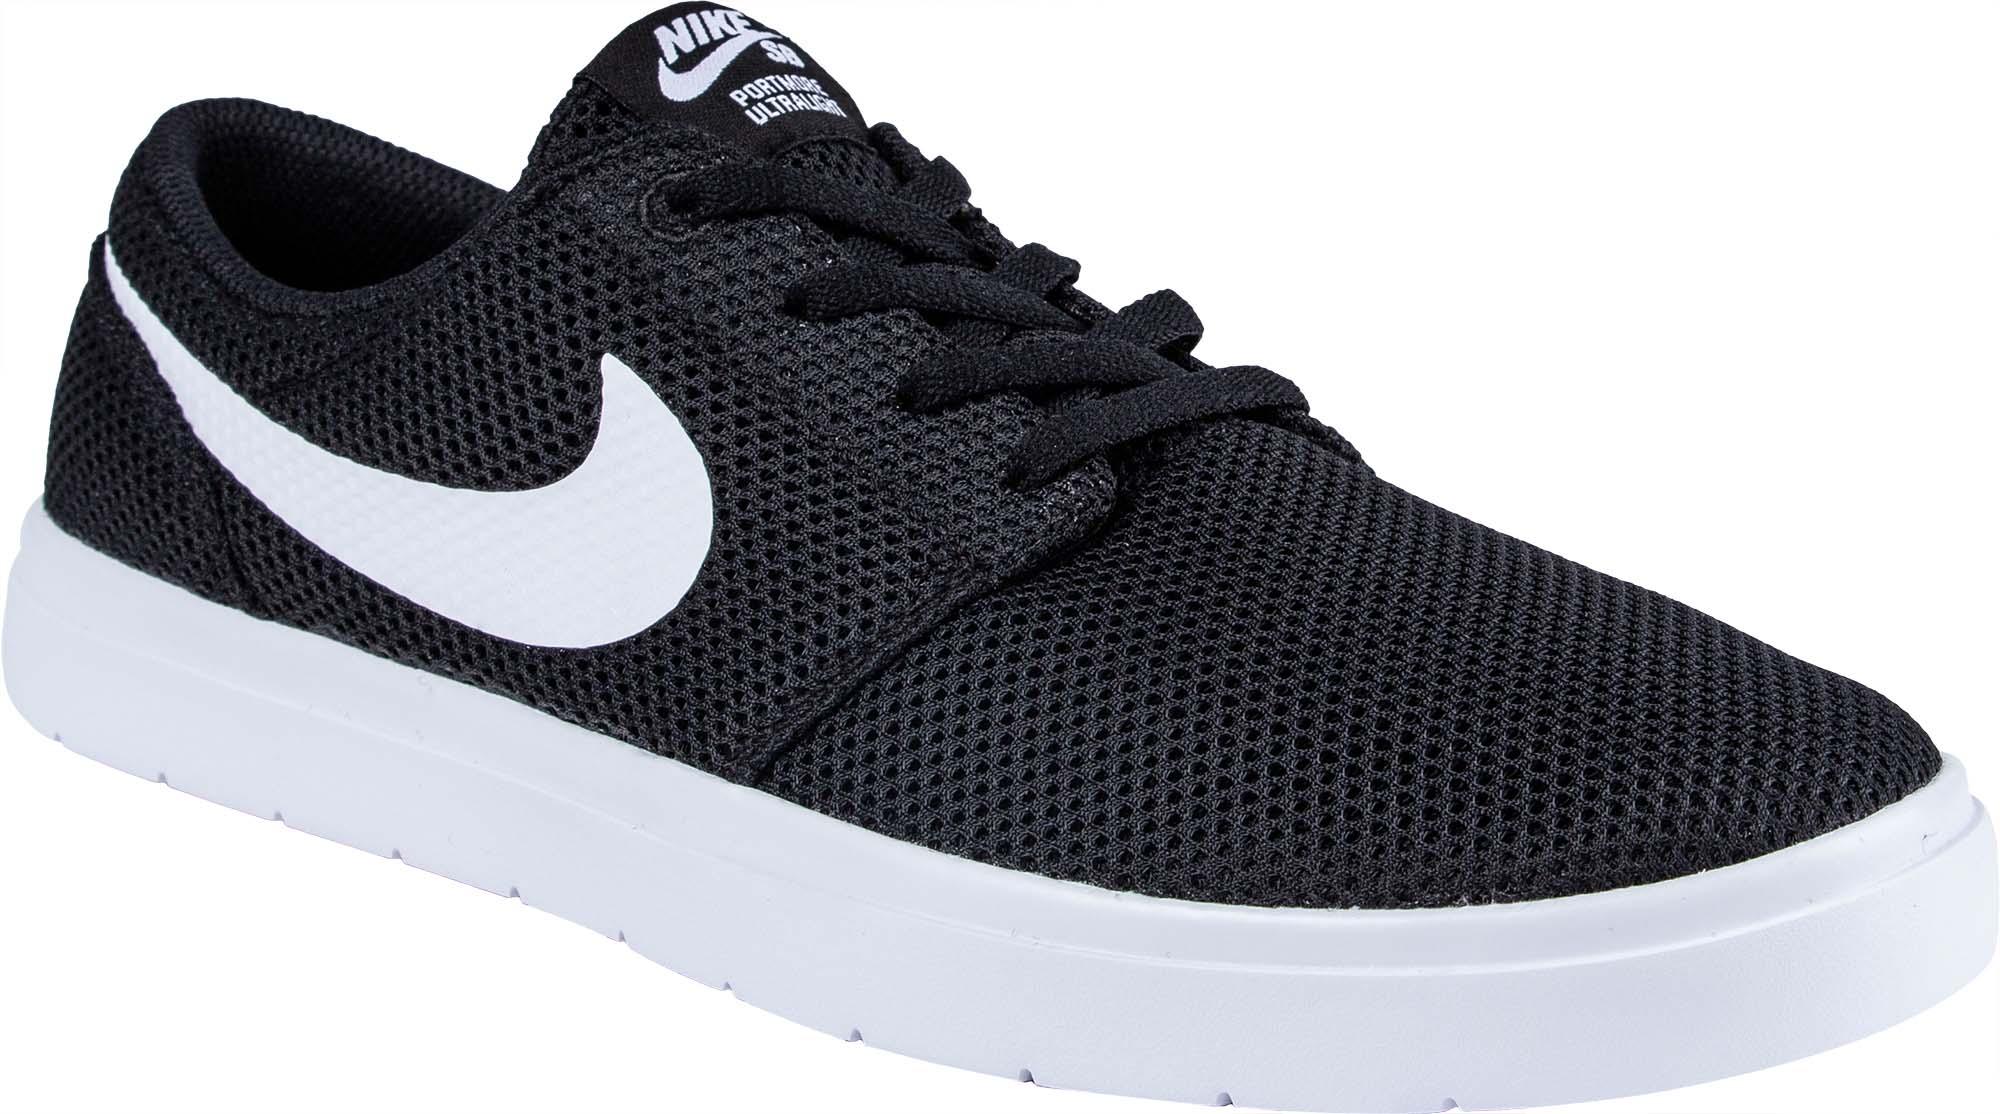 Nike SB Portmore II Ultralight Skateboarding